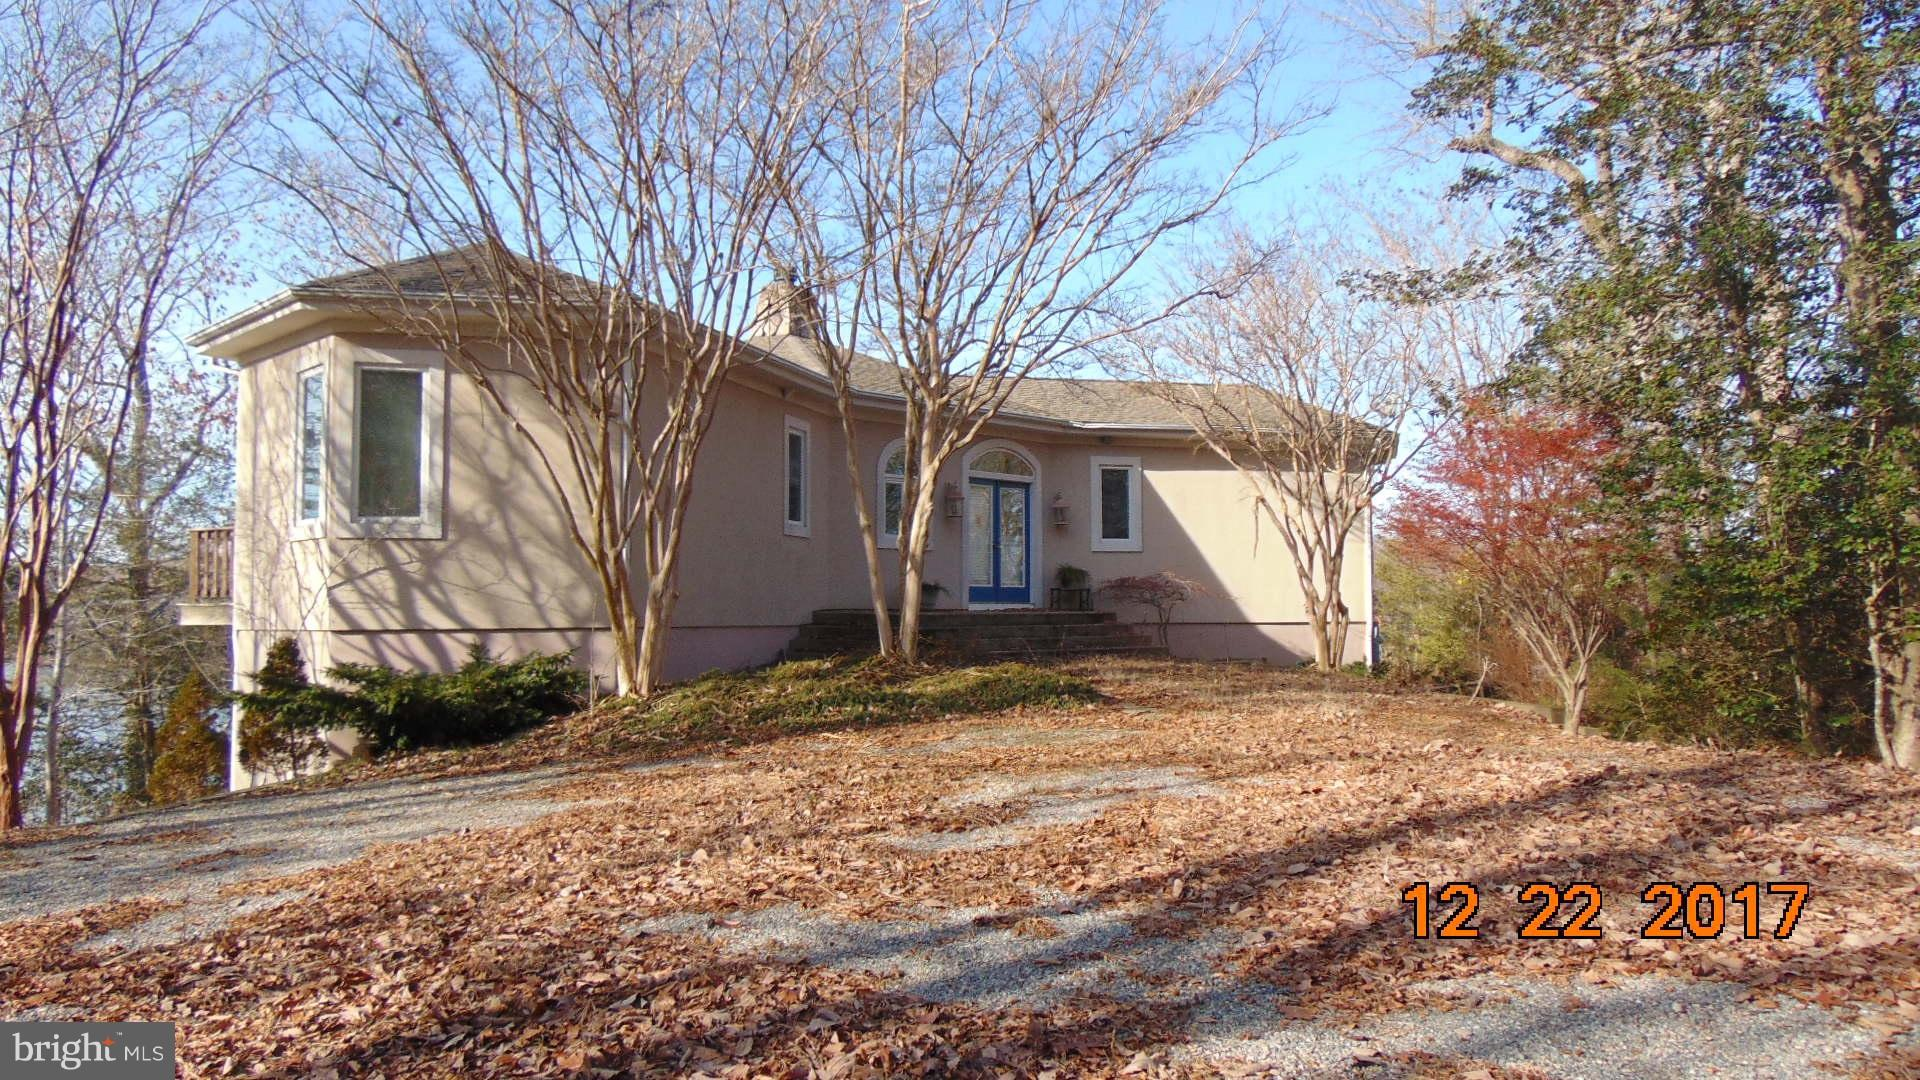 474 Edge Hill Farm Rd, Heathsville, VA, 22473